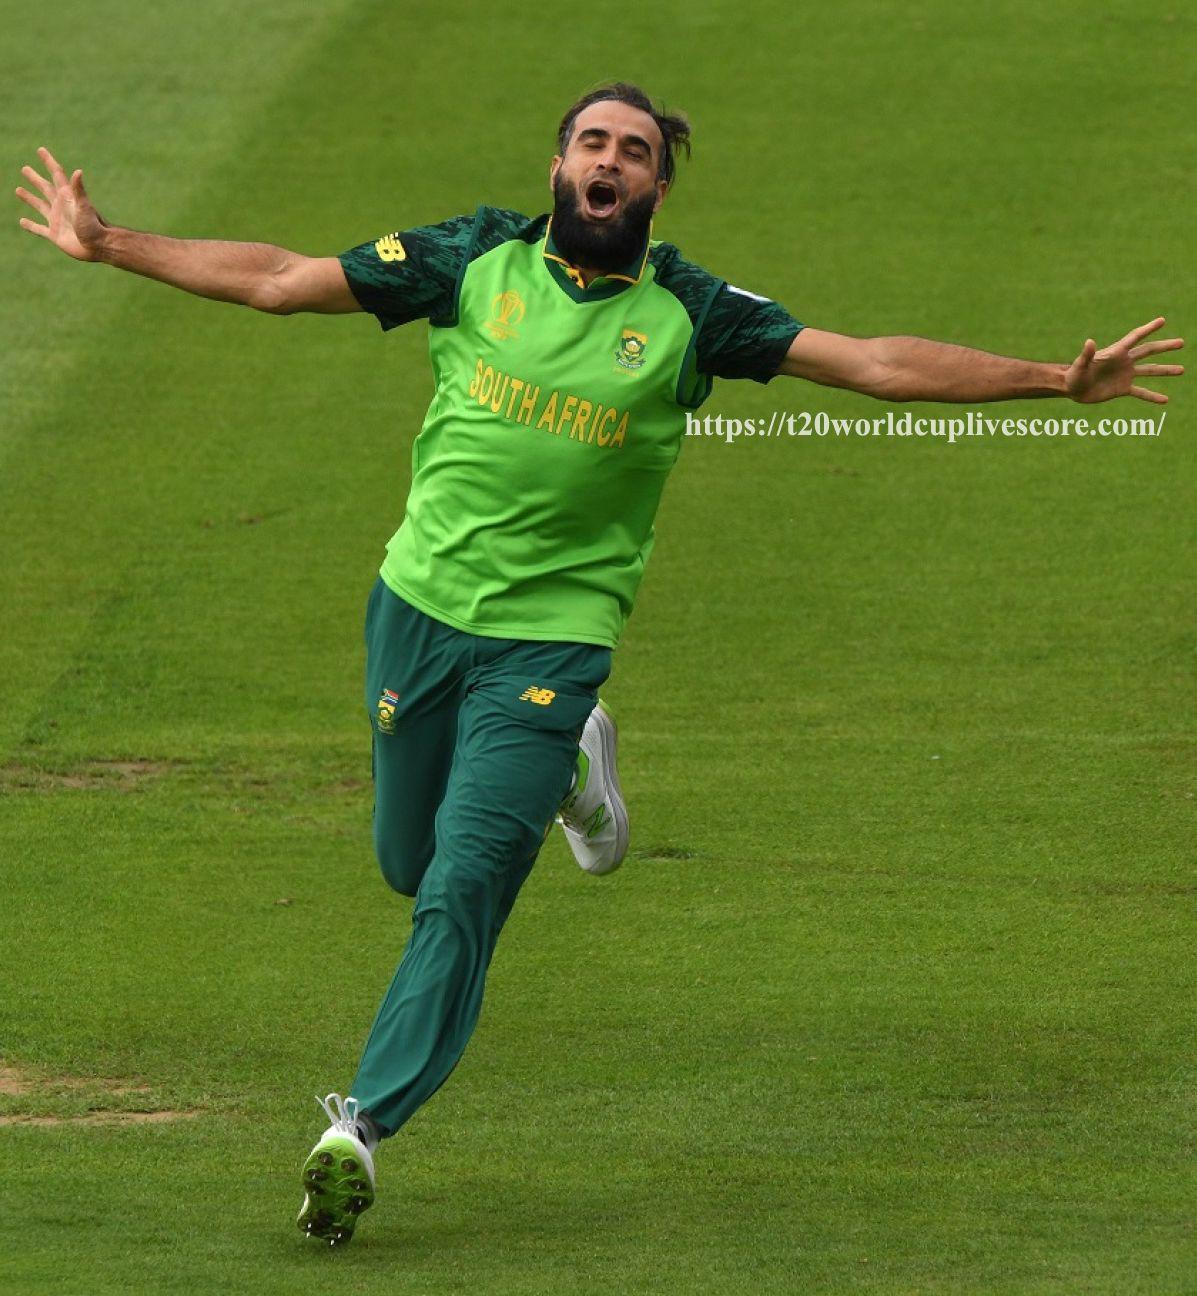 Imran Tahir 4 Wicket Taker in T20 Cricket